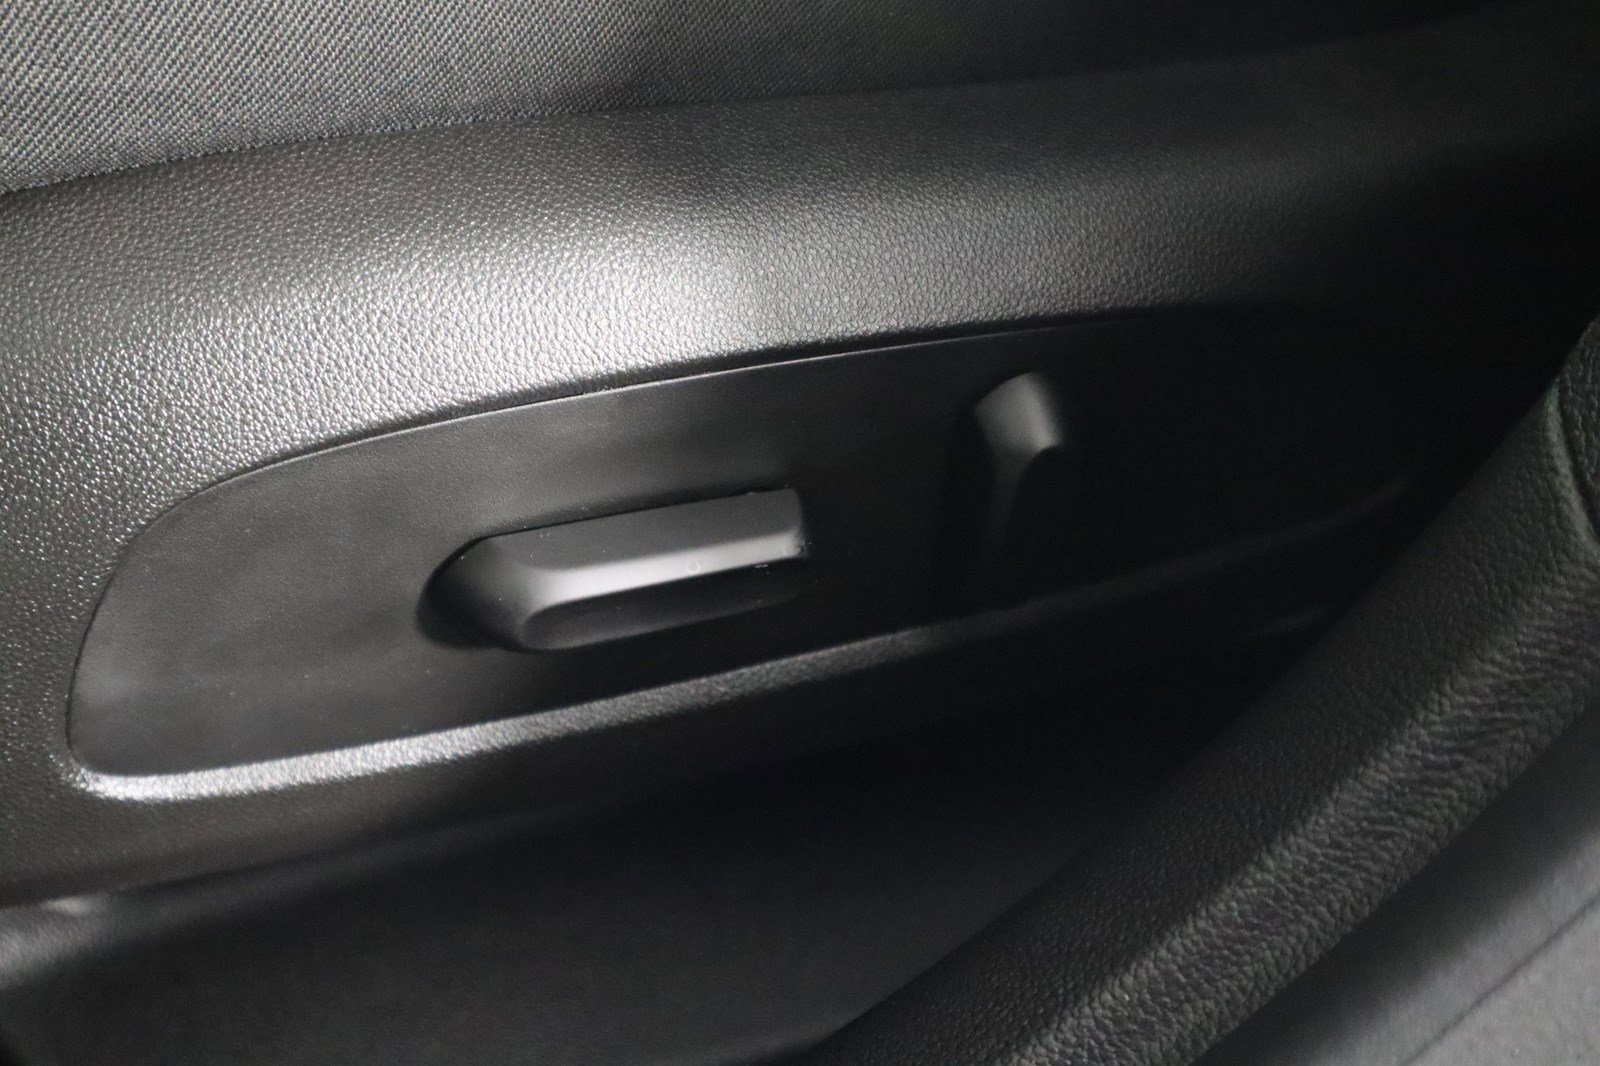 Pre-Owned 2017 Chevrolet Cruze LT